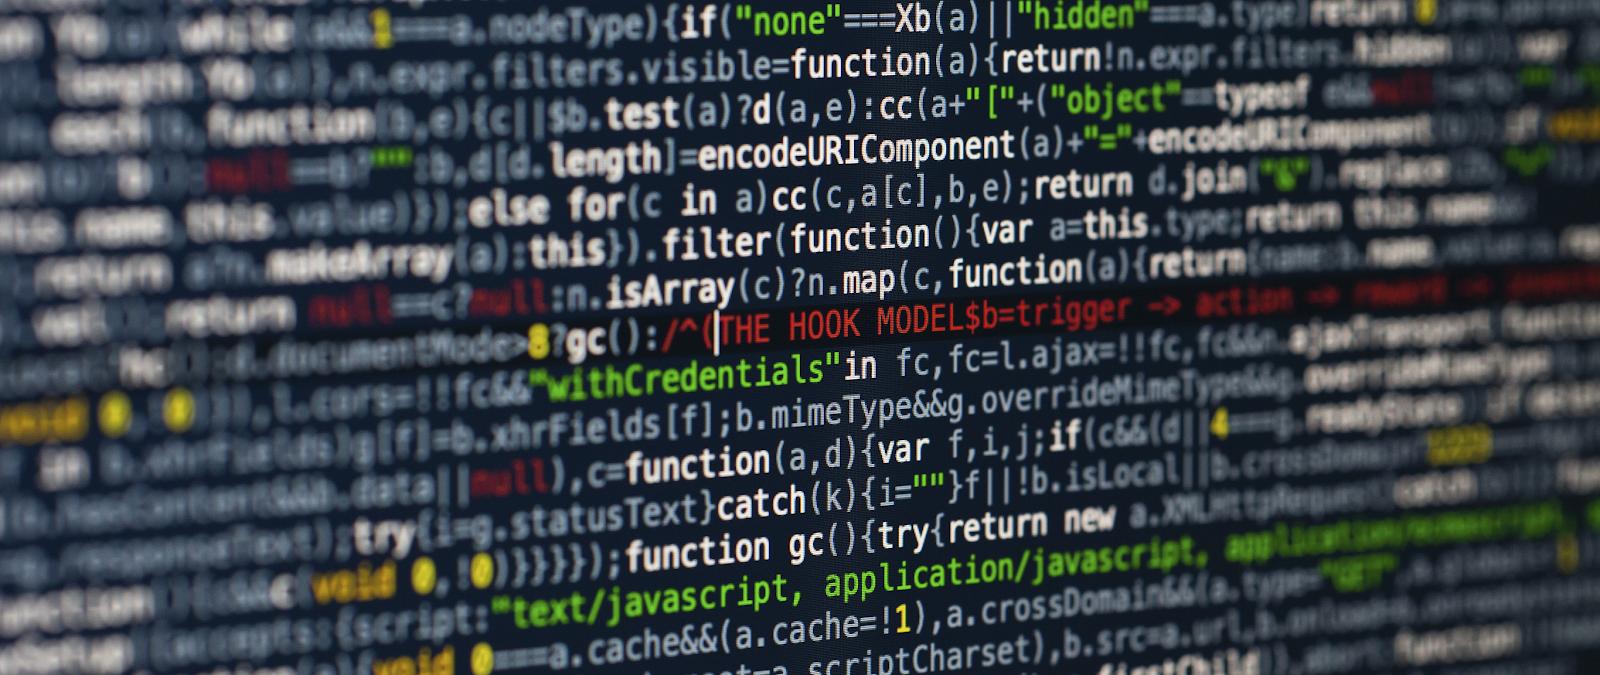 Ultra wide desktop code wallpaper